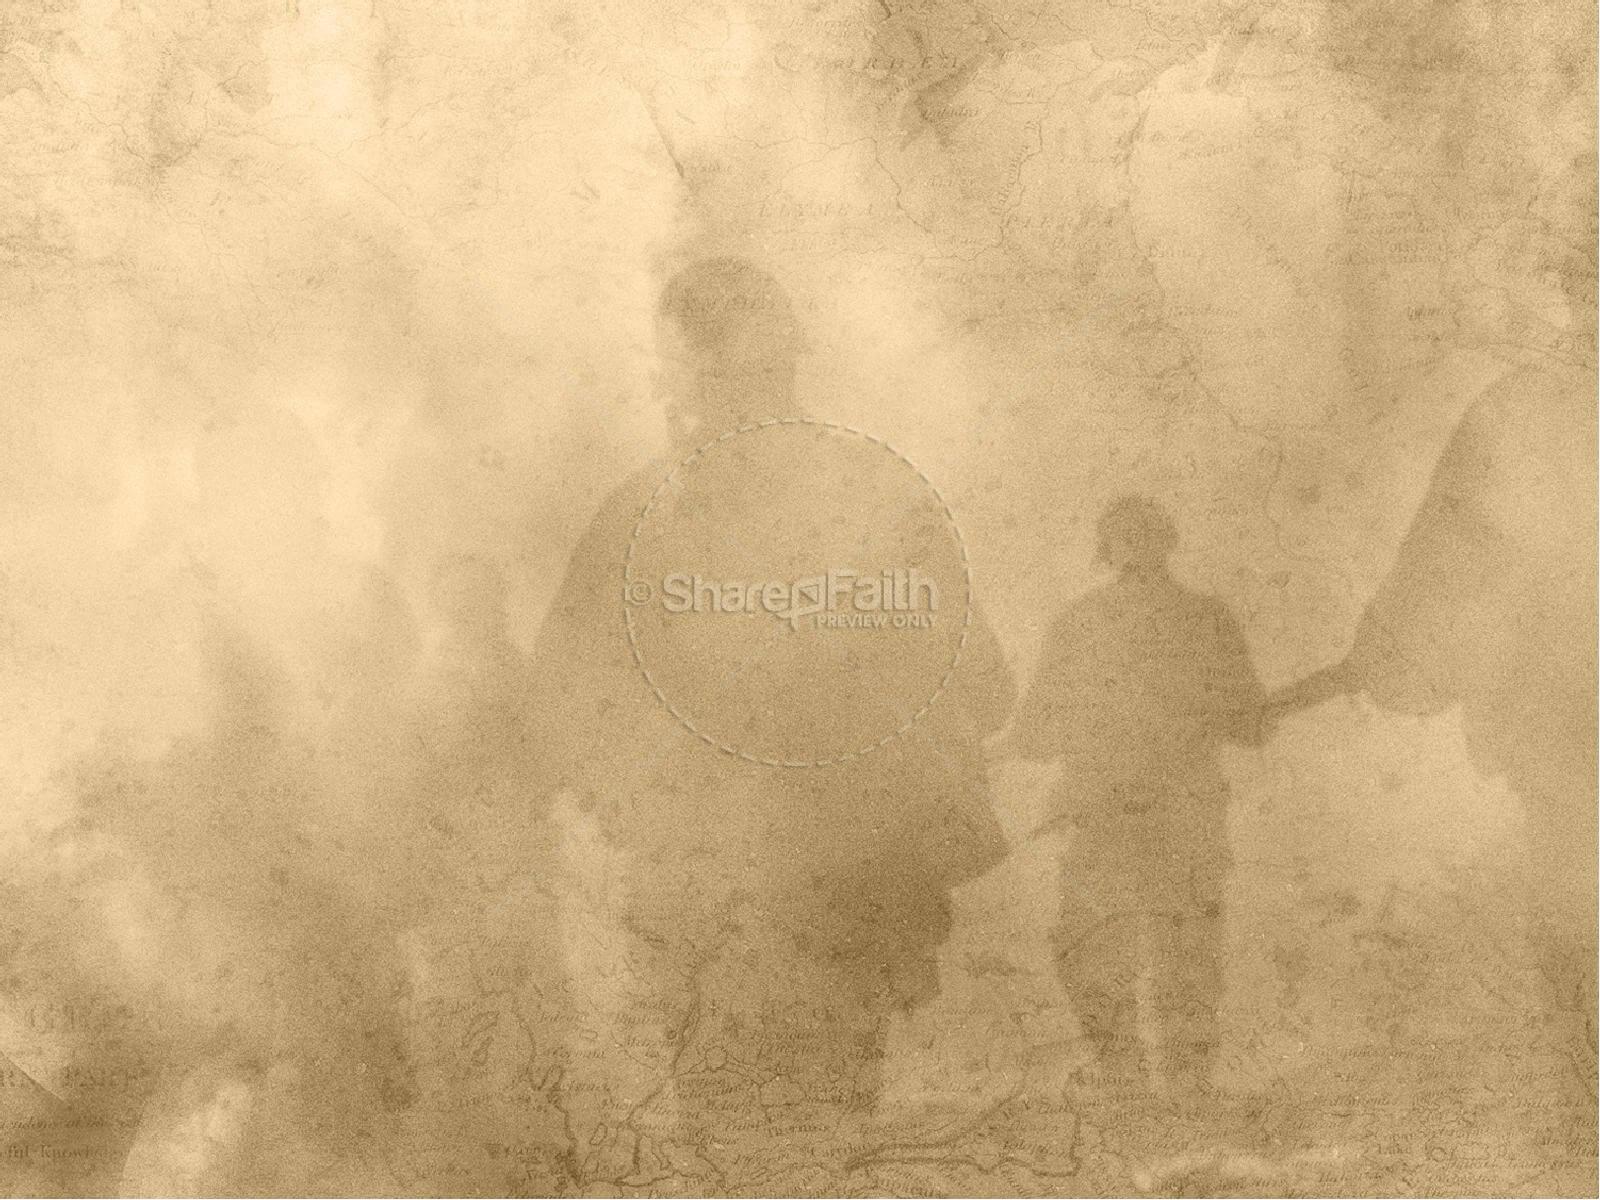 Spiritual Battle Sermon Powerpoint Template | Powerpoint Sermons With Powerpoint Templates War